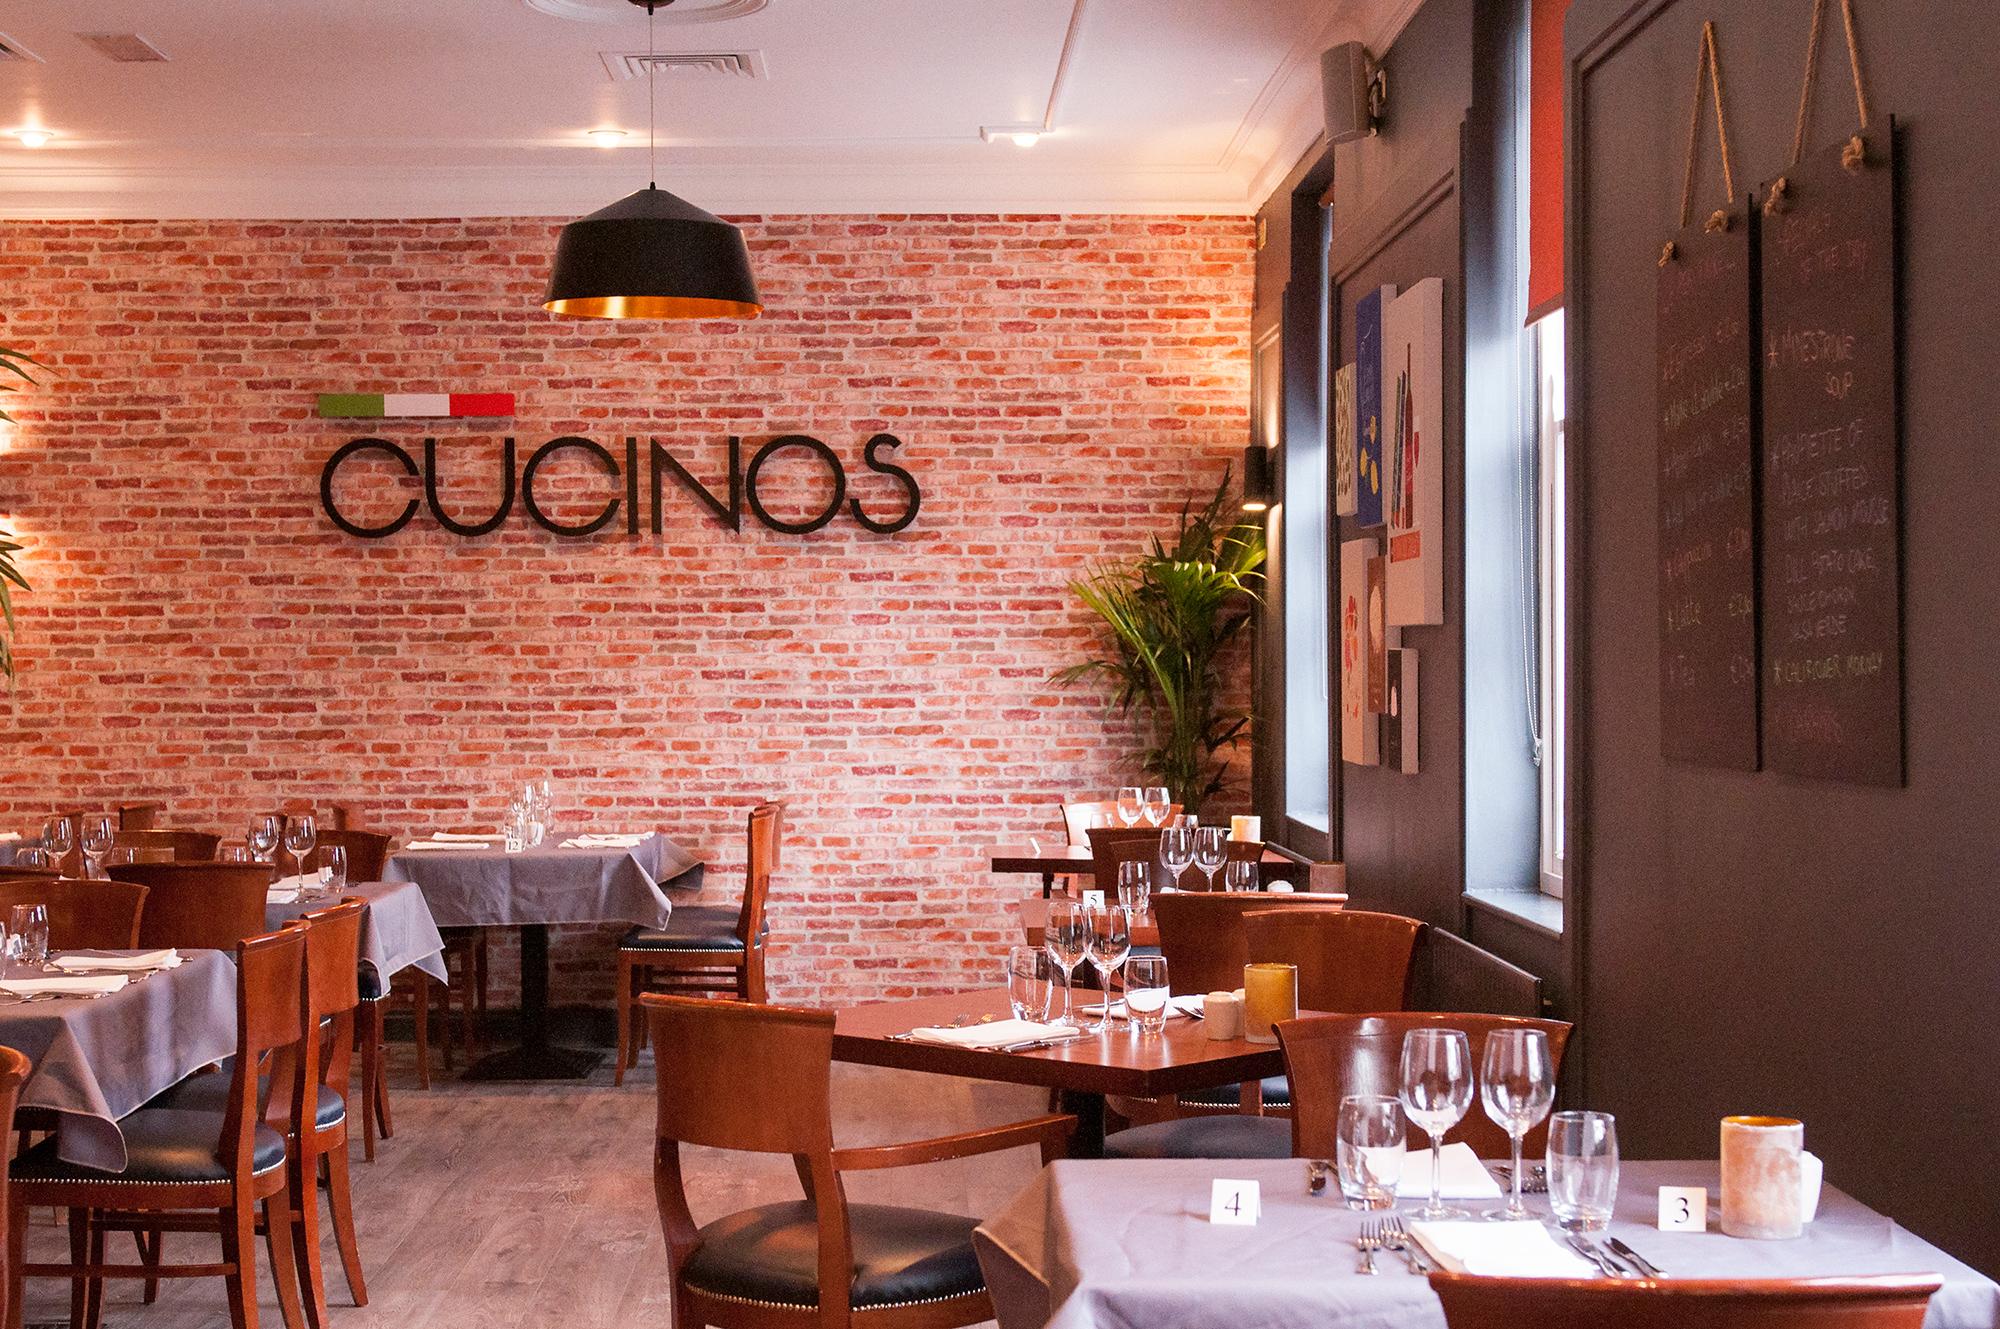 cucinos-restaurant